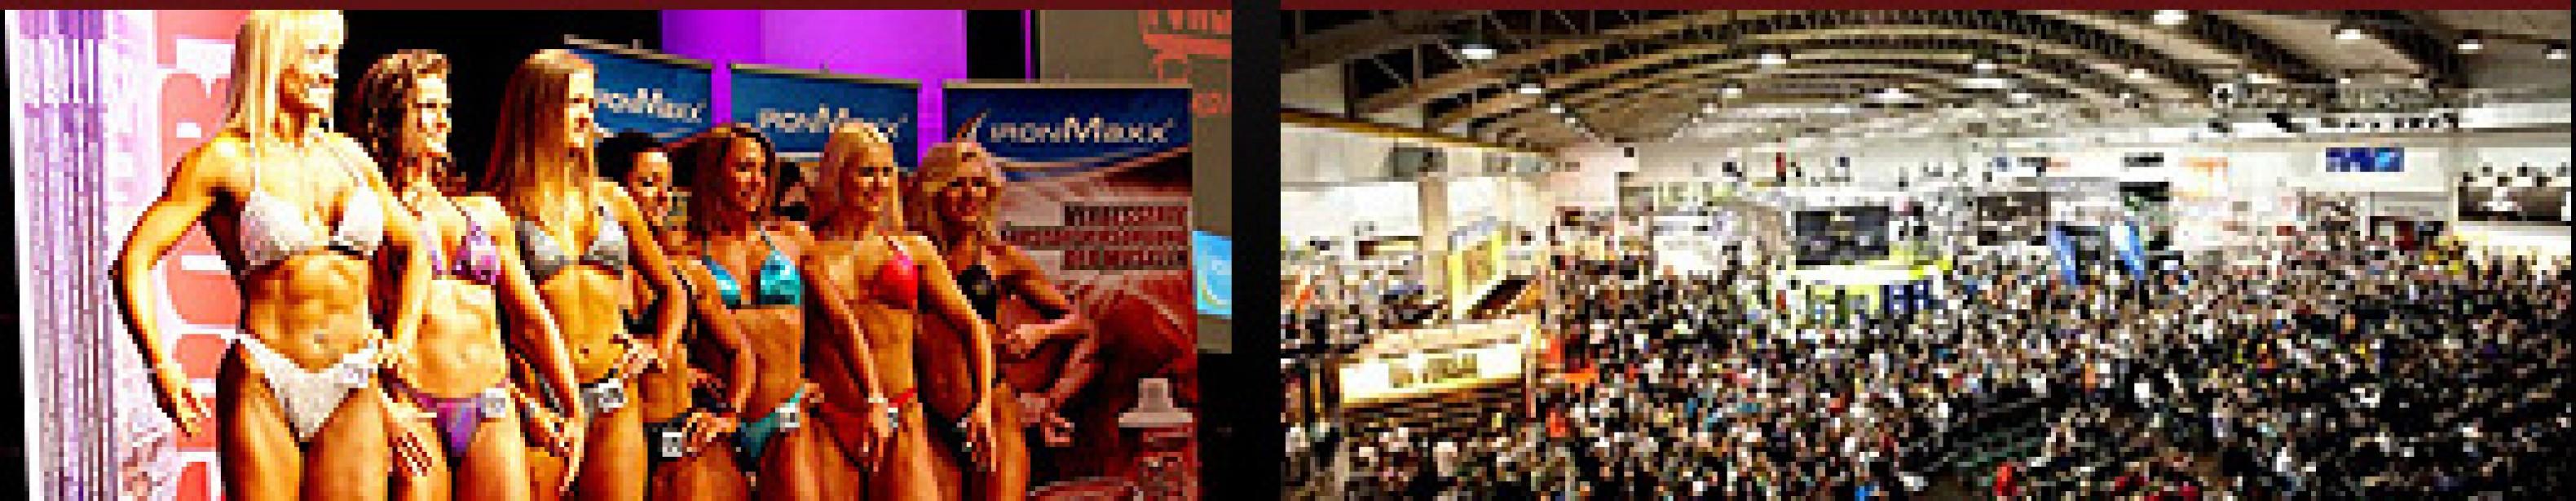 FIBO Contest and Expo Information - Essen, Germany